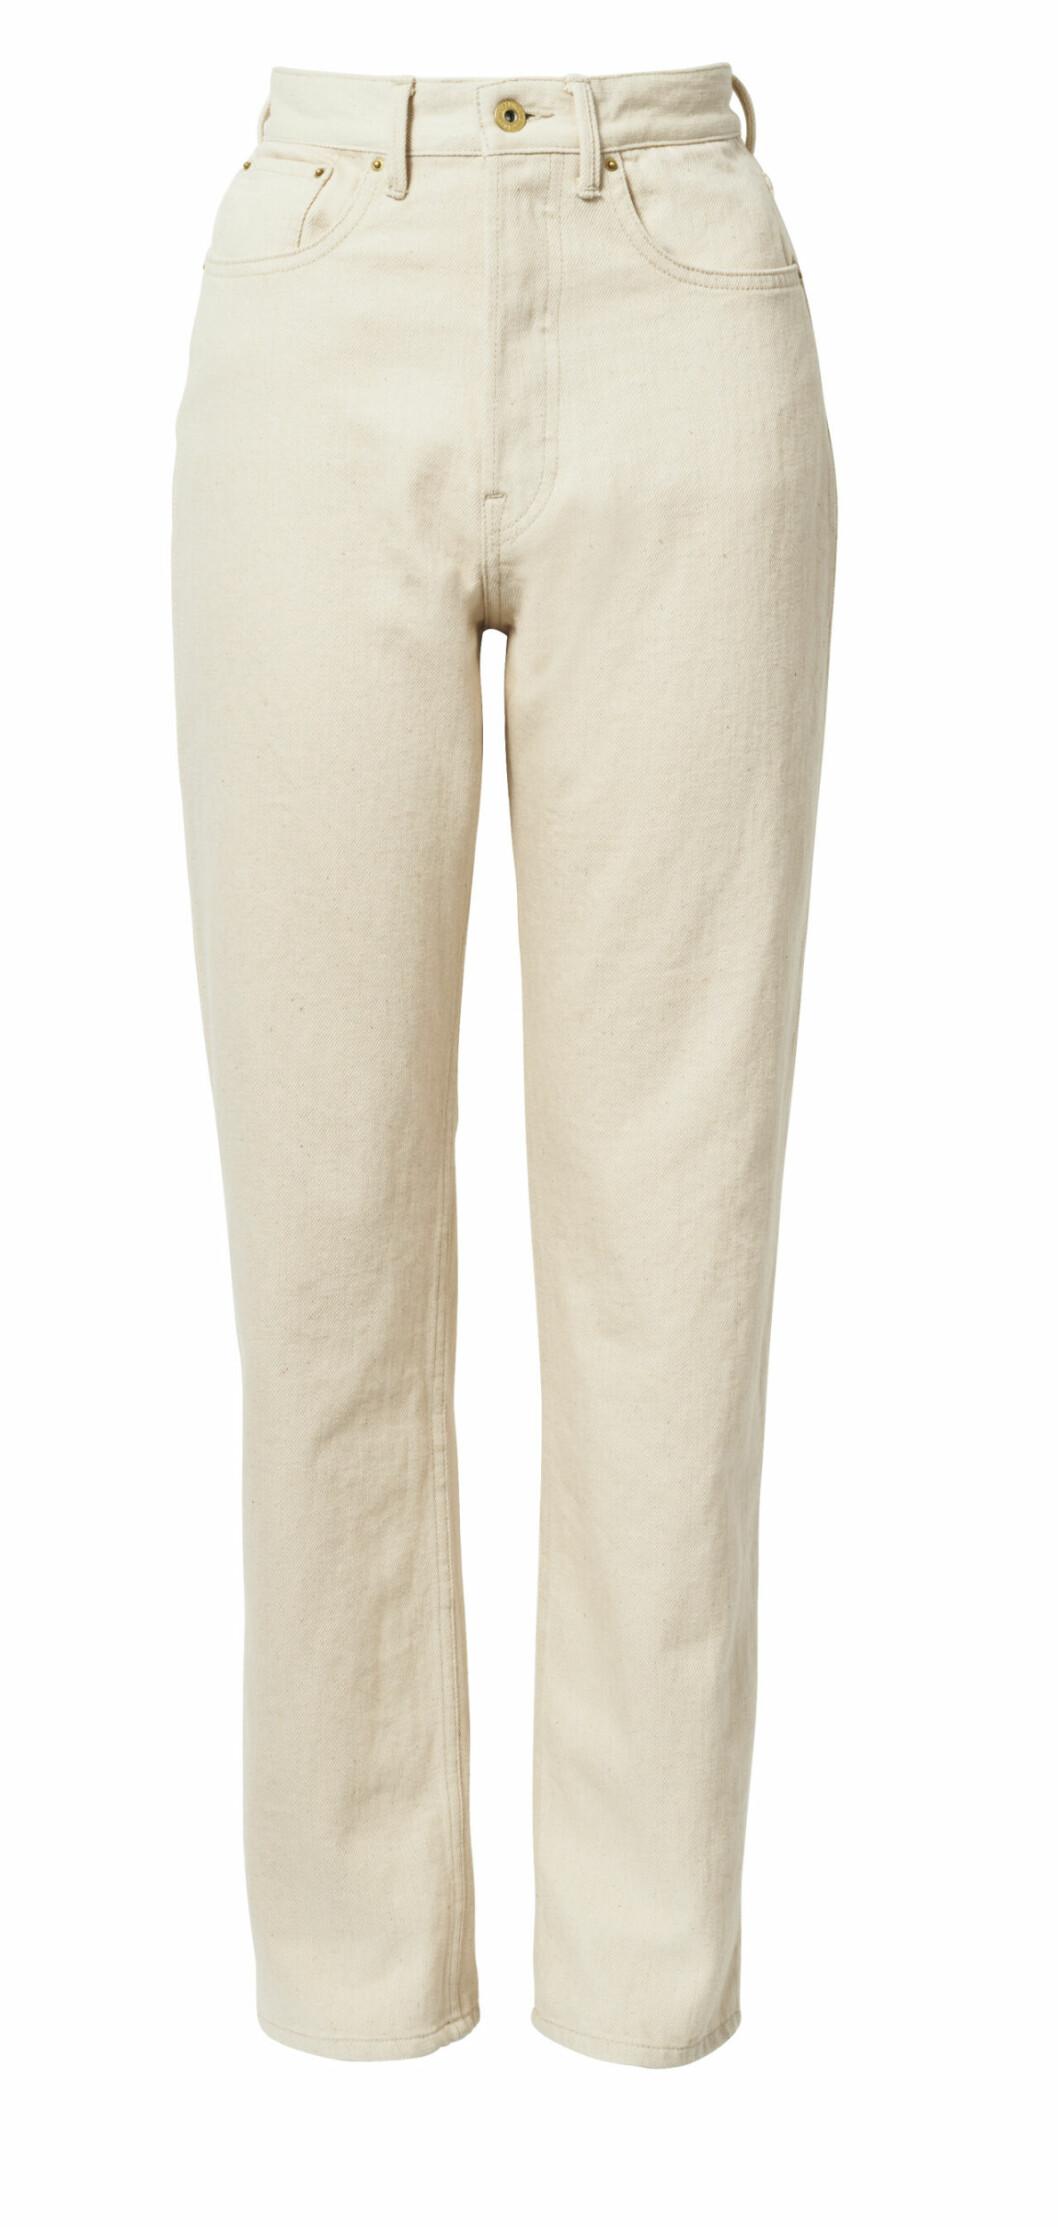 H&M conscious exclusive SS20 – beige jeans